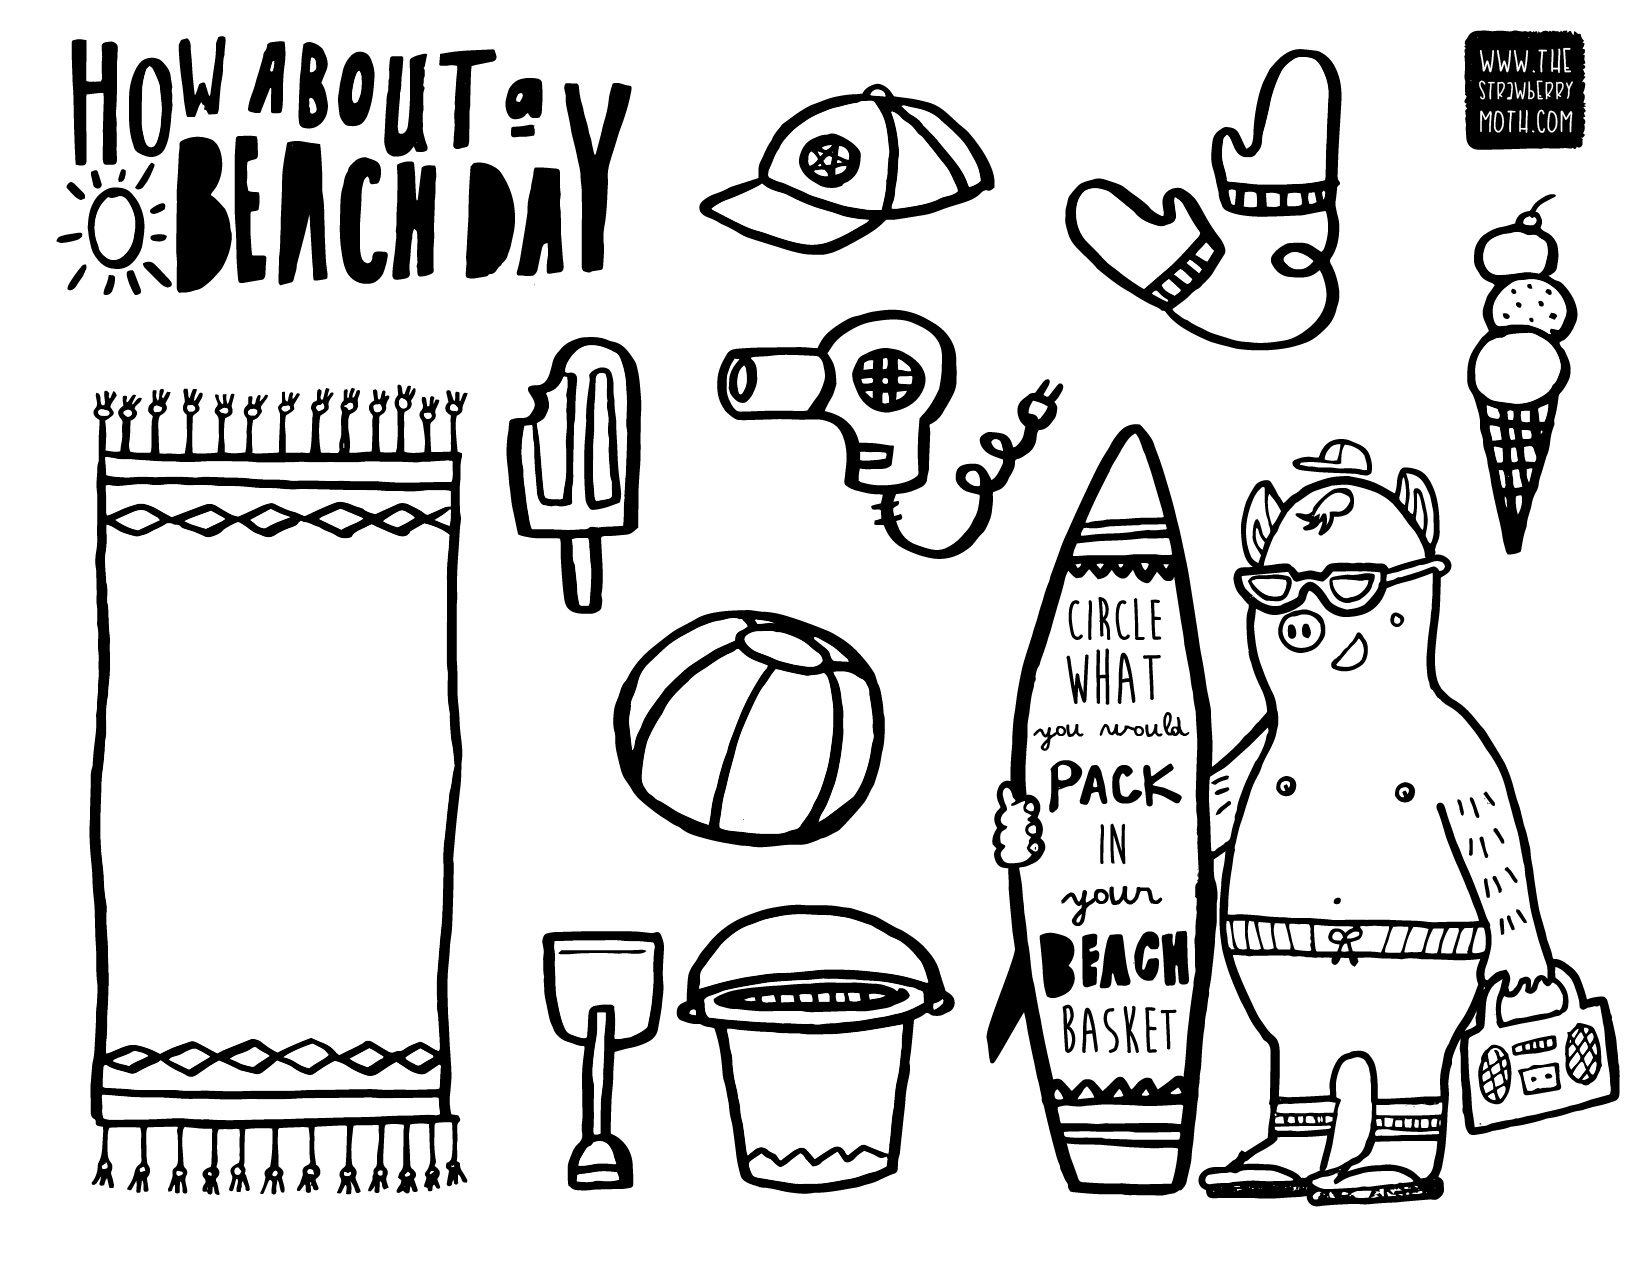 BeachDay_ActivityPage-01.jpg